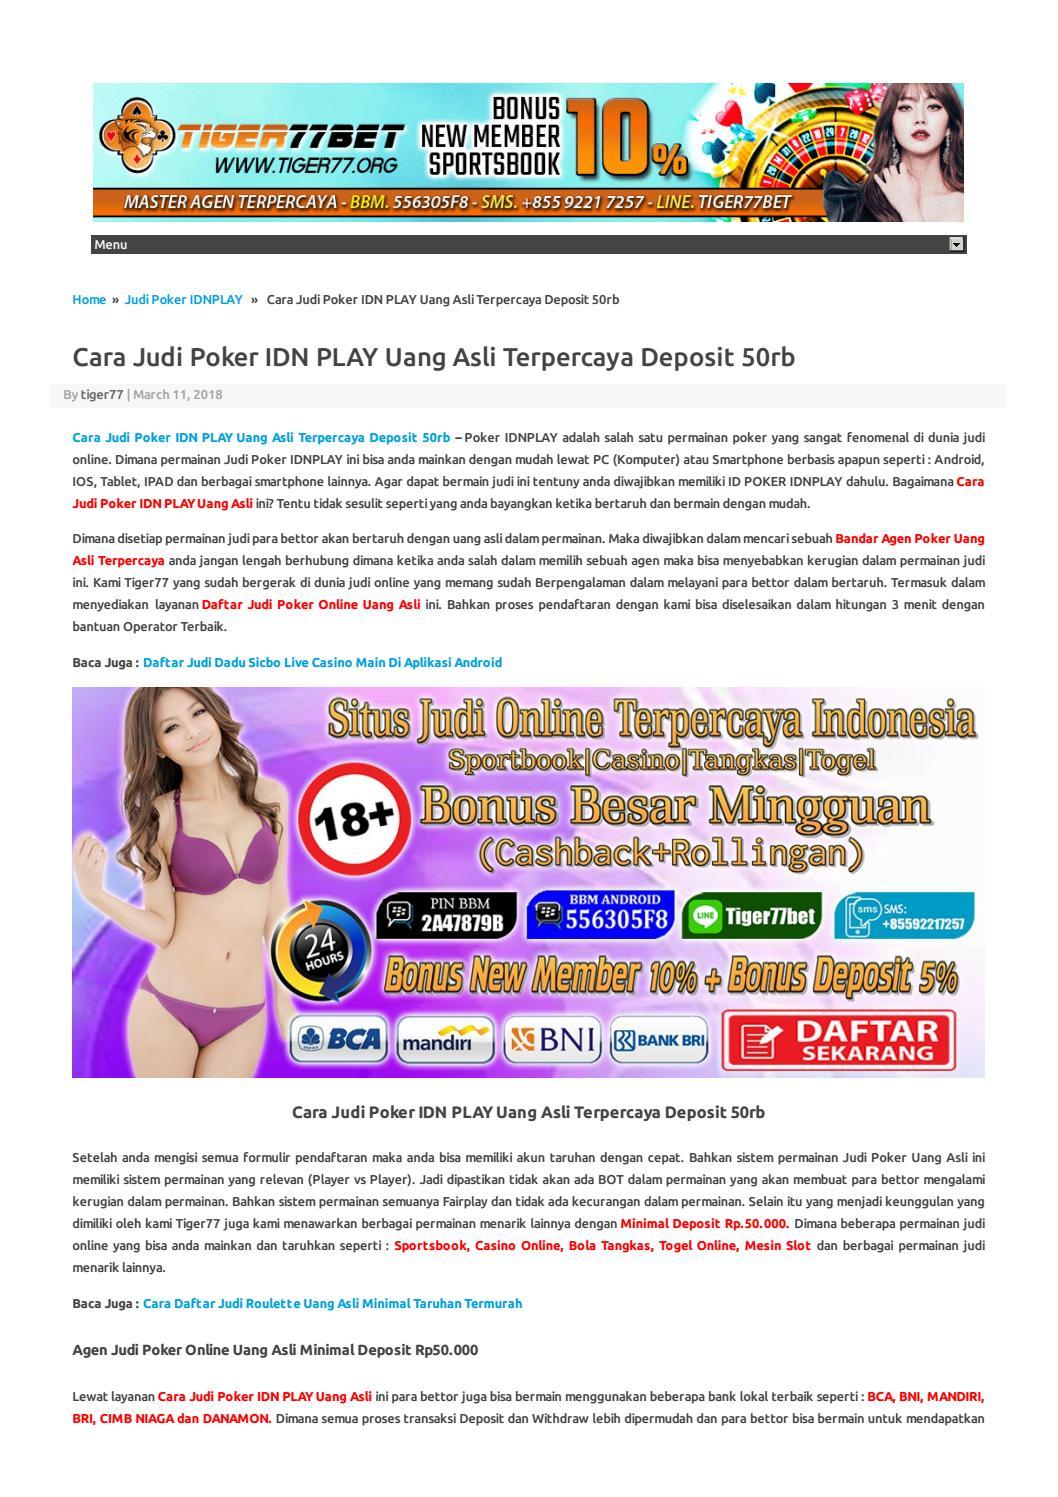 Info Tentang Online Terpercaya Idn Play